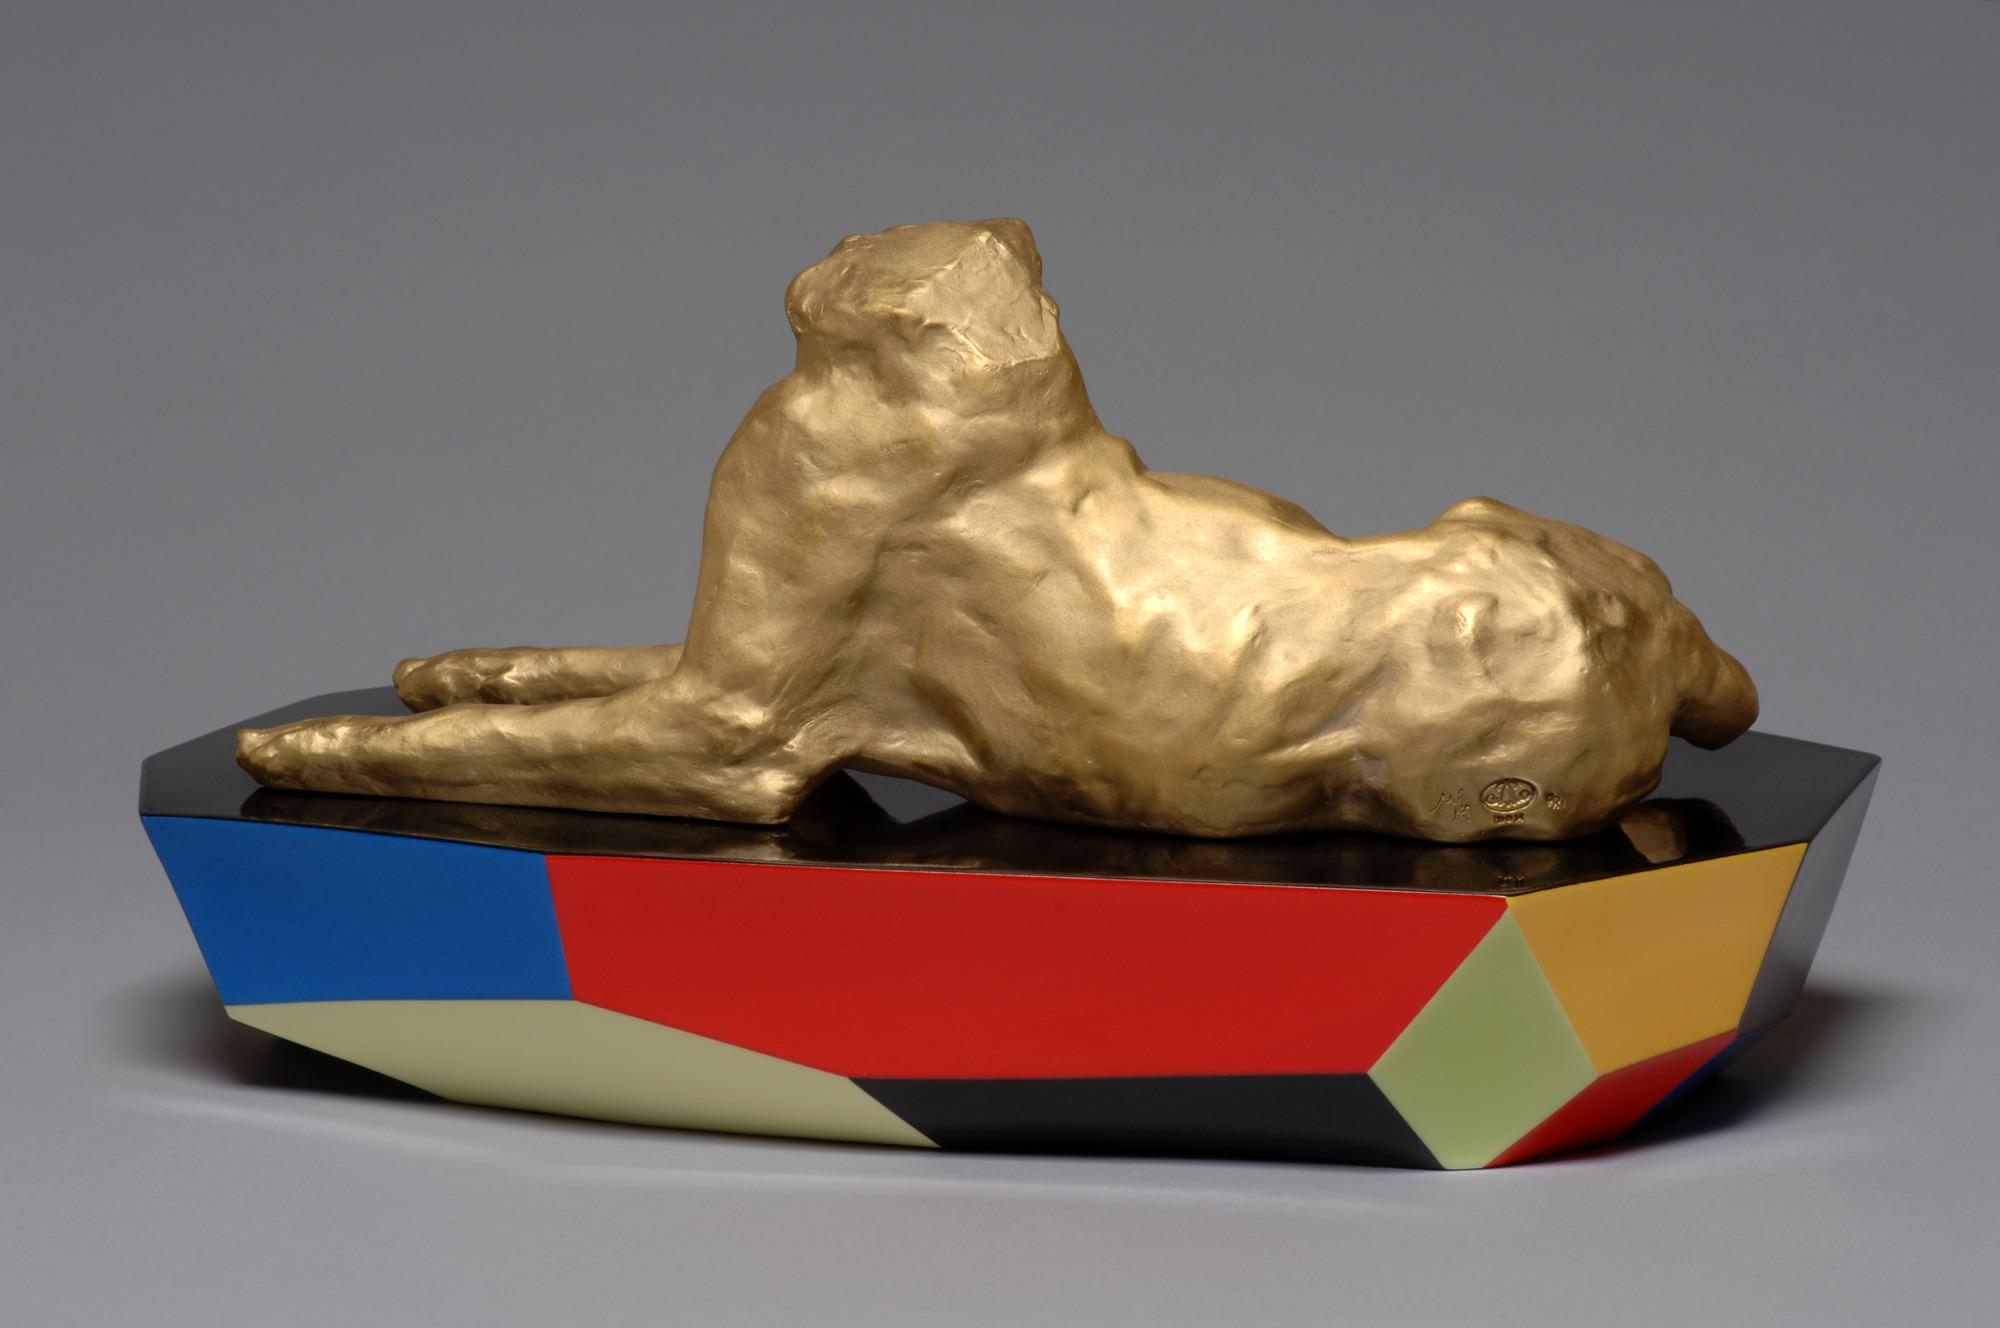 Méchita-Myriam-I-dream-of-a-golden-dream--003.jpg